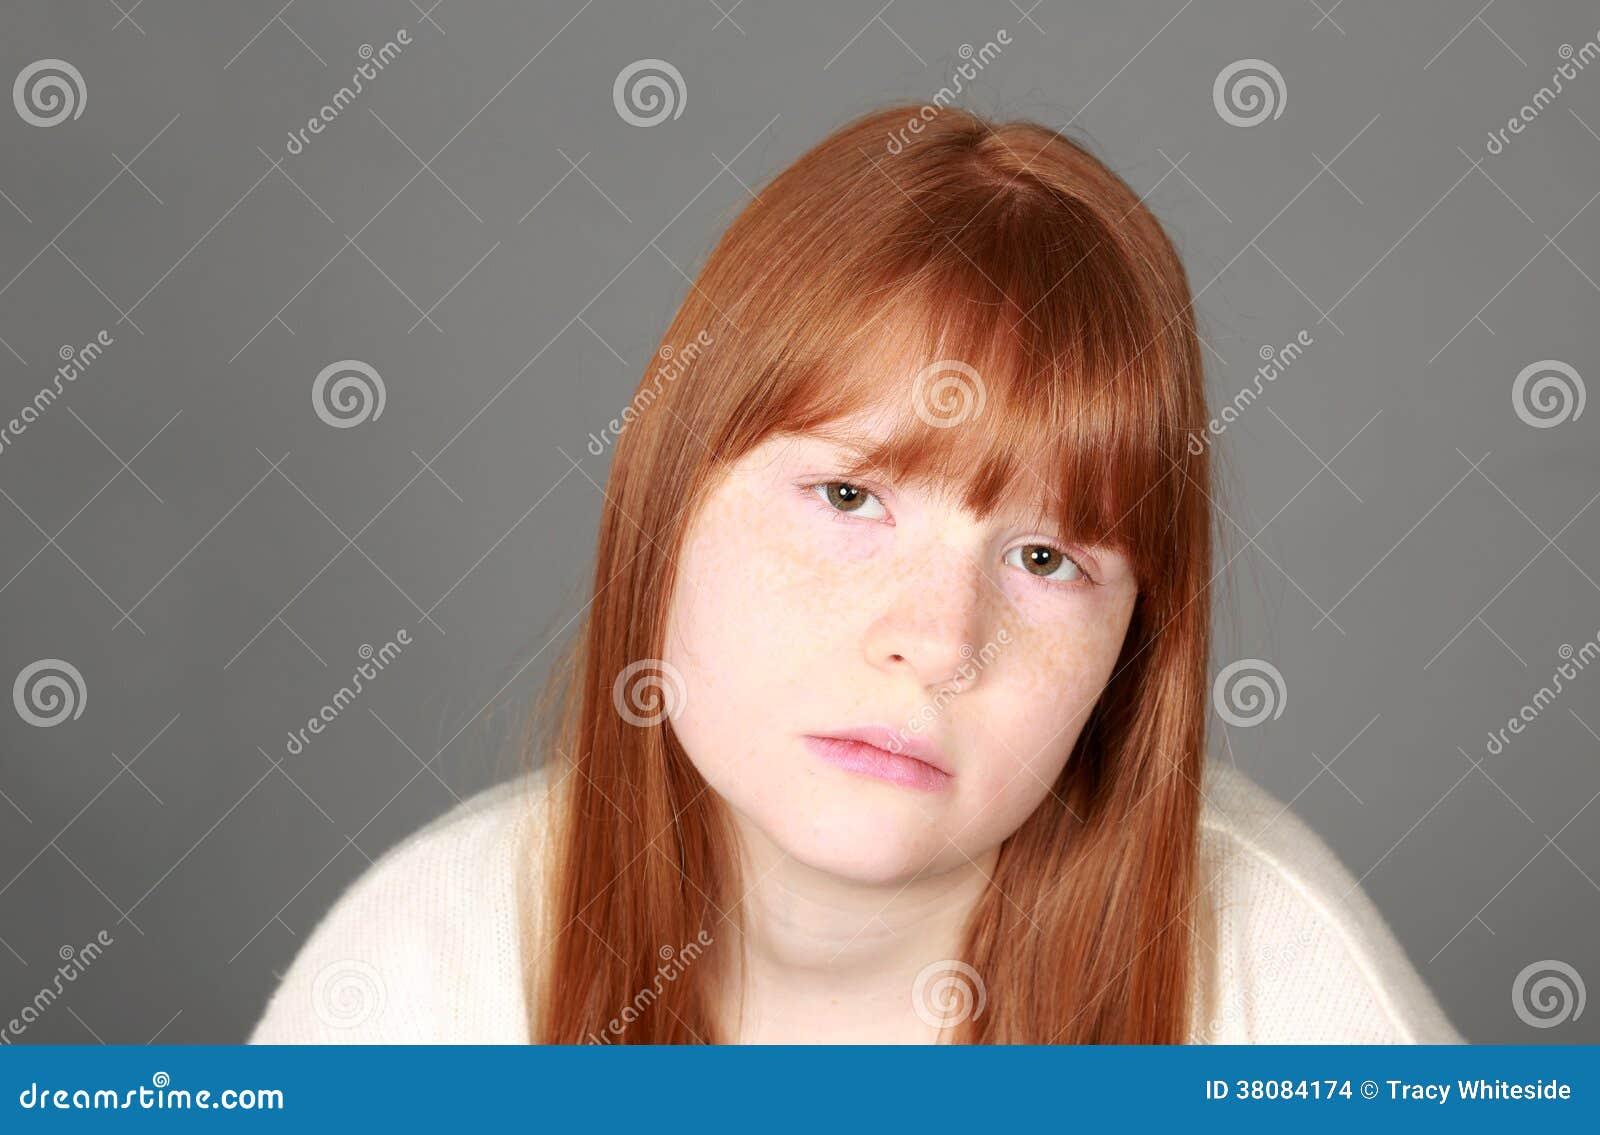 Redhead freckles photos